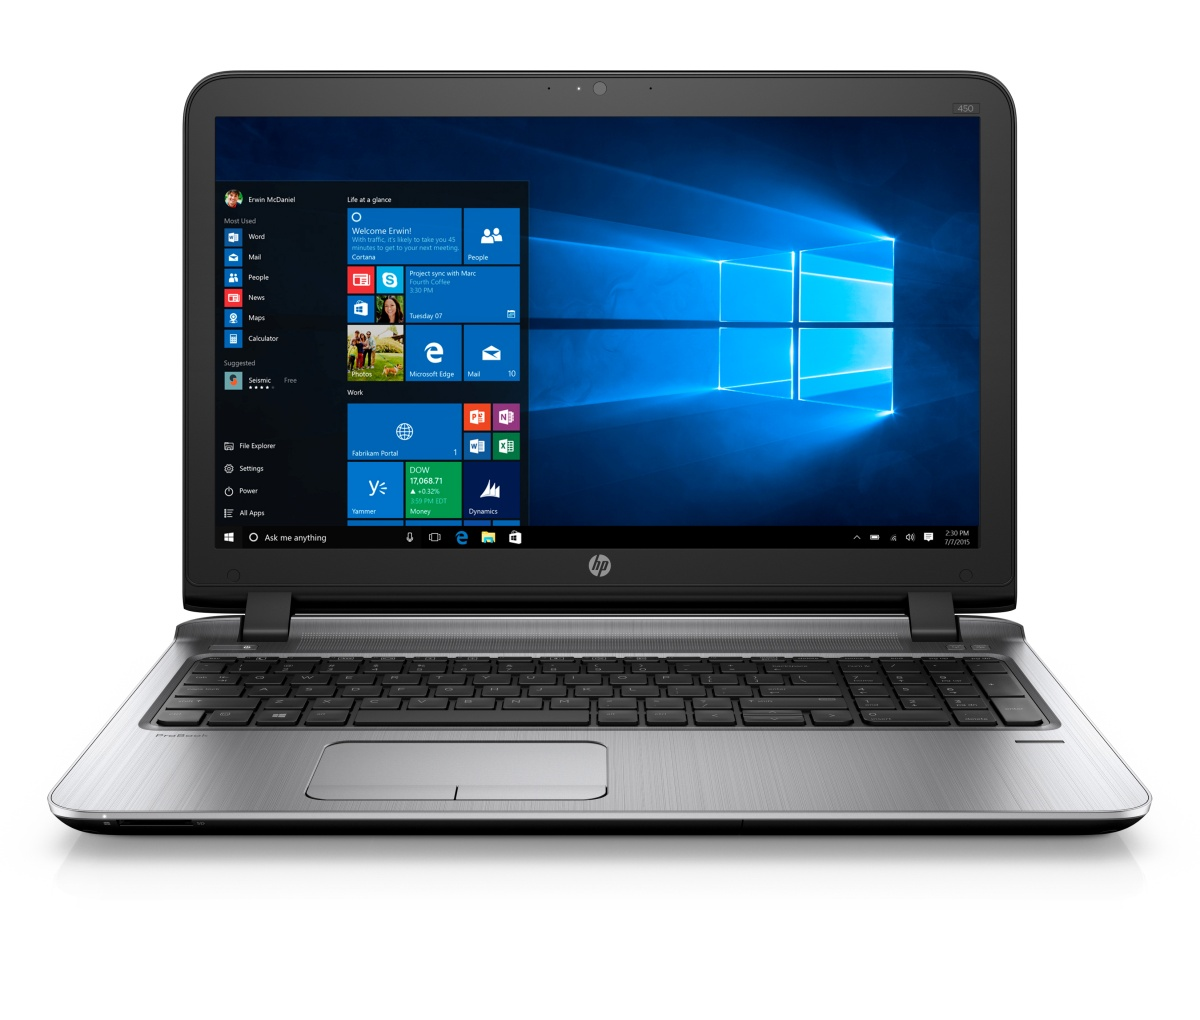 "HP ProBook 450 G3 15.6"" FHD/i5-6200U/4GB/256SSD/DVD/VGA/HDMI/RJ45/WIFI/BT/MCR/FPR/1Rservis/7+10P"